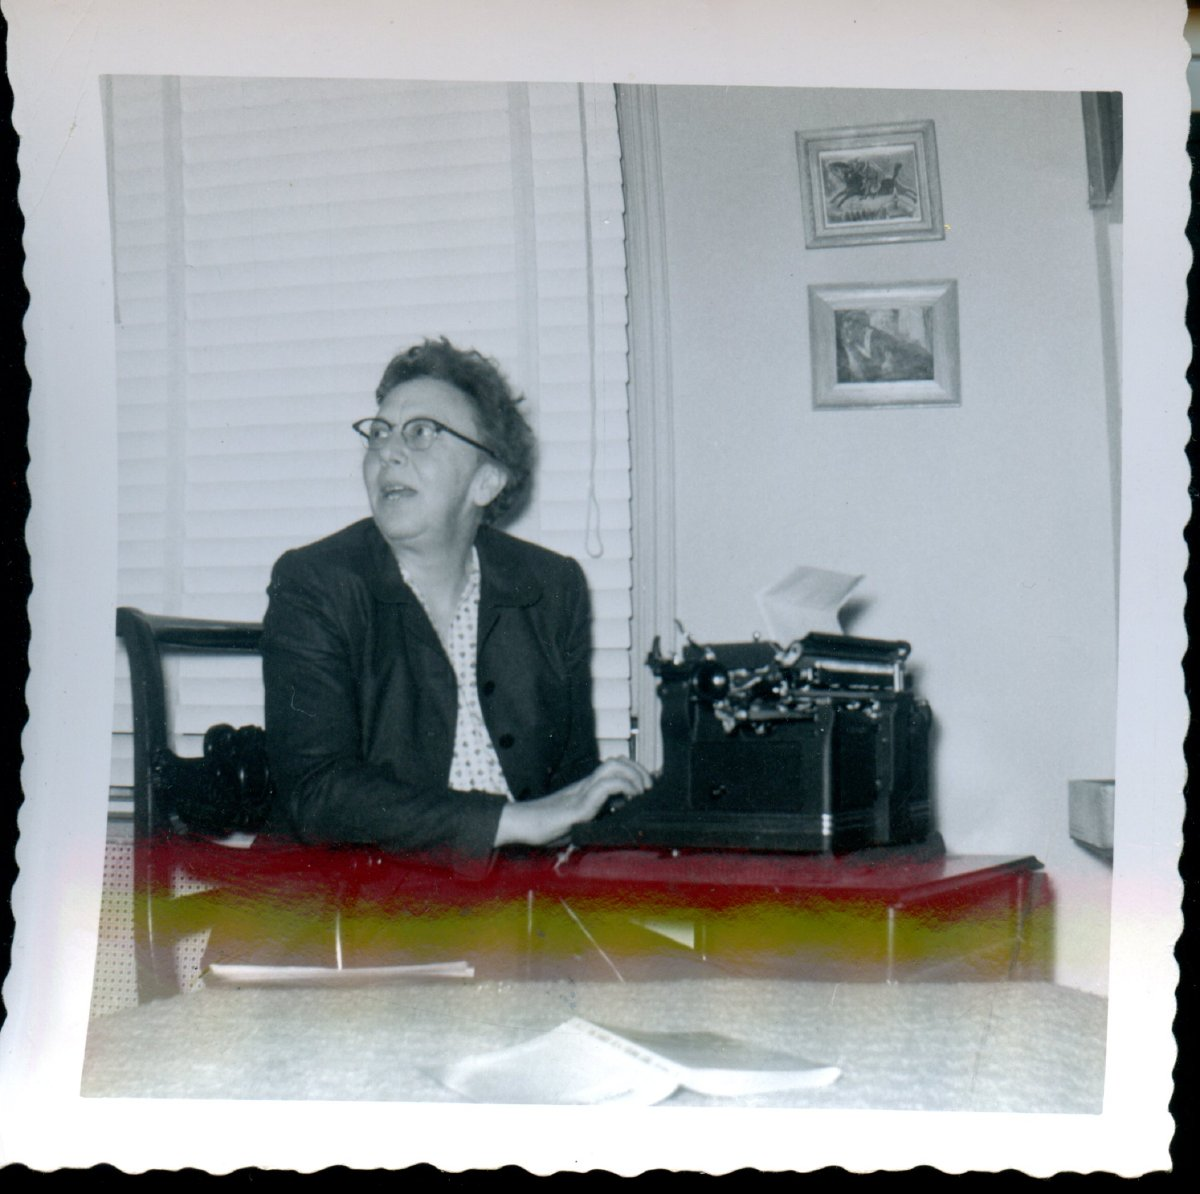 Moore, Ruth at her typewriter.